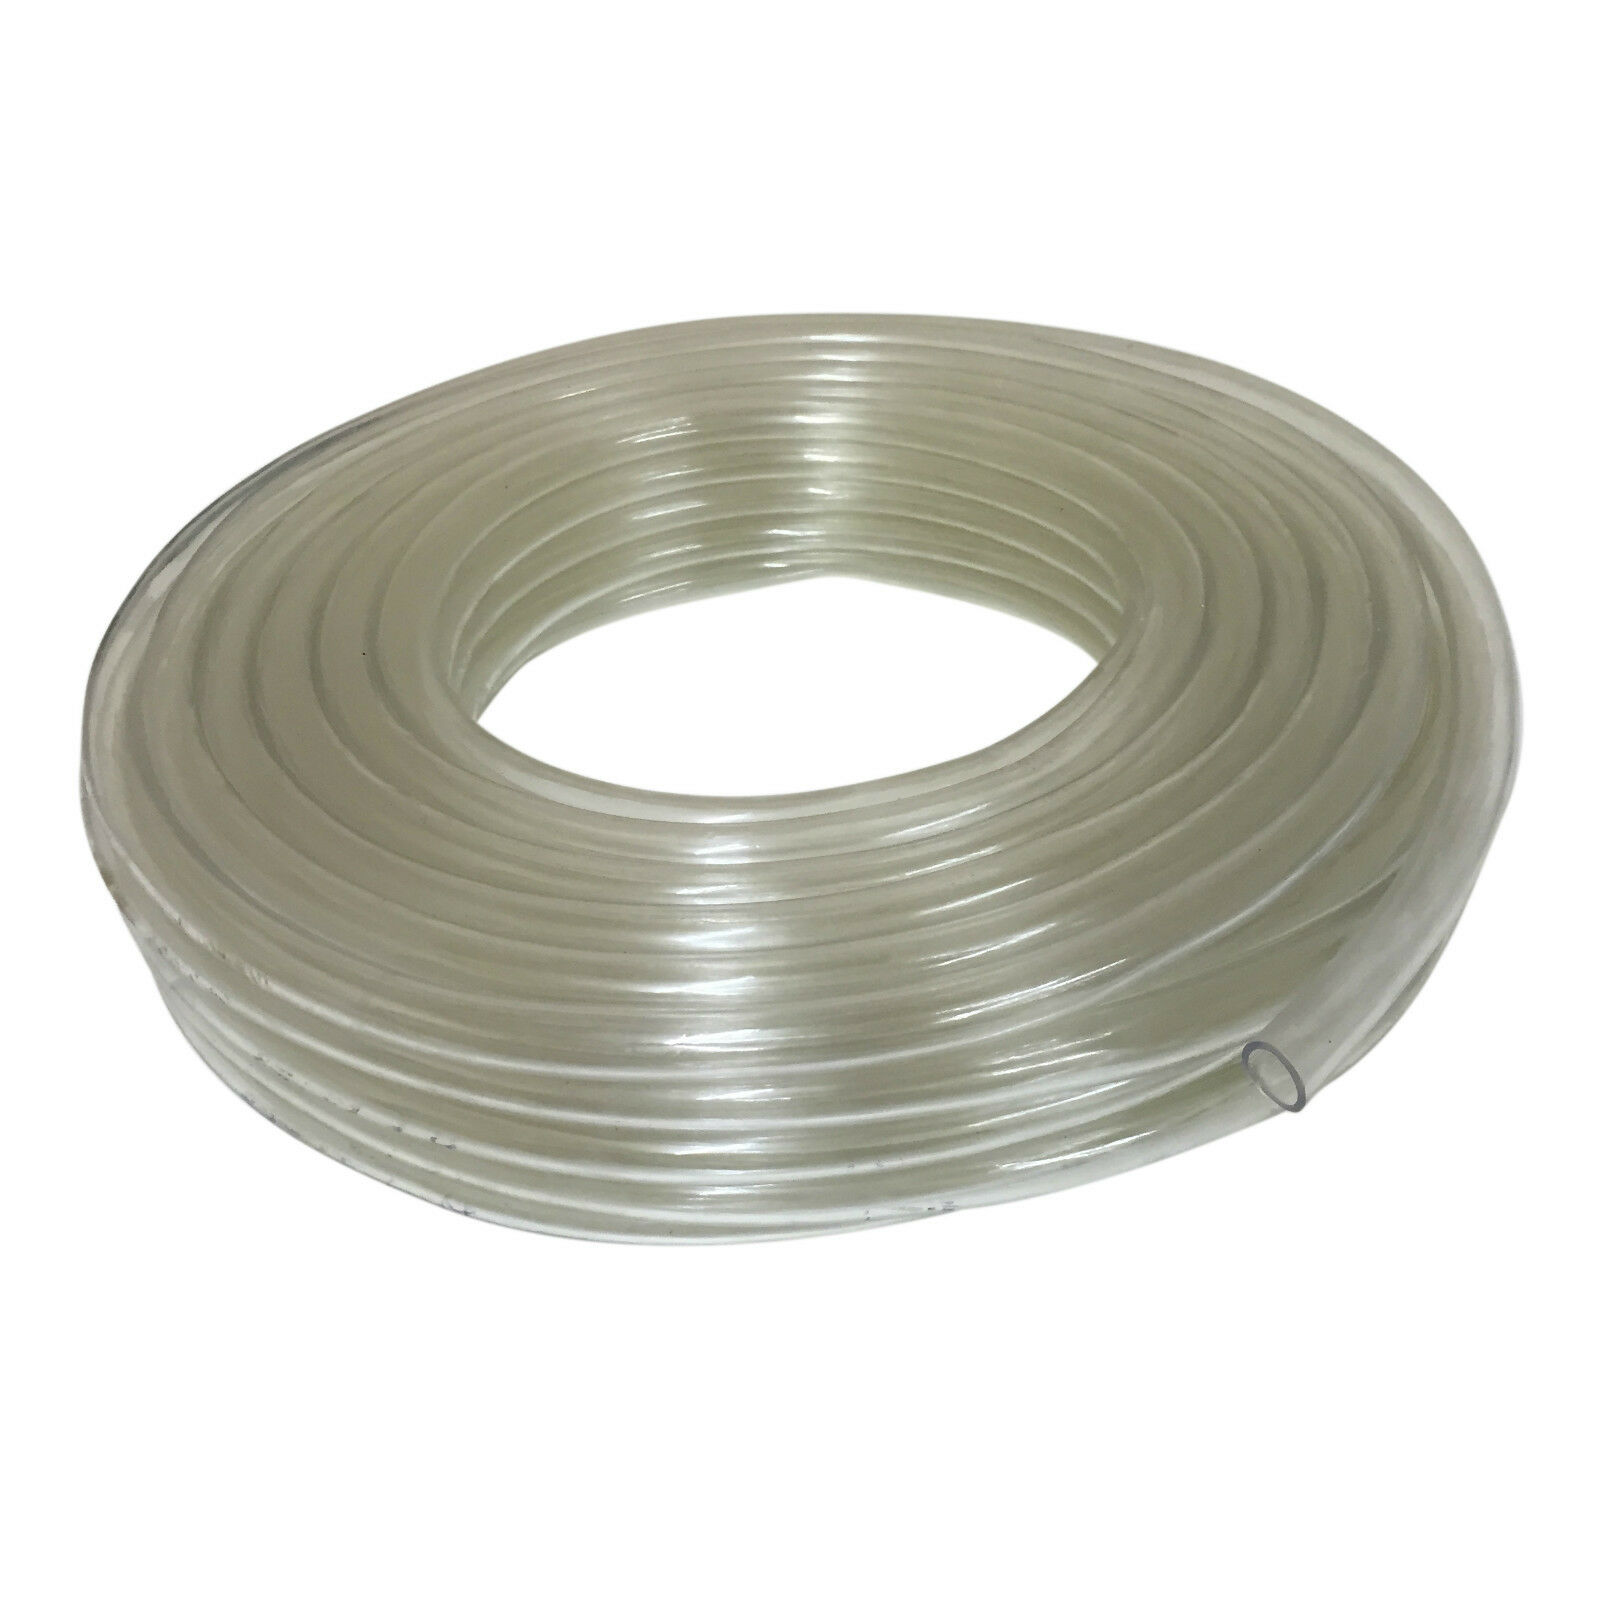 clear pvc tubing flexible plastic hose pipe for fish tank aquarium ponds car ebay. Black Bedroom Furniture Sets. Home Design Ideas